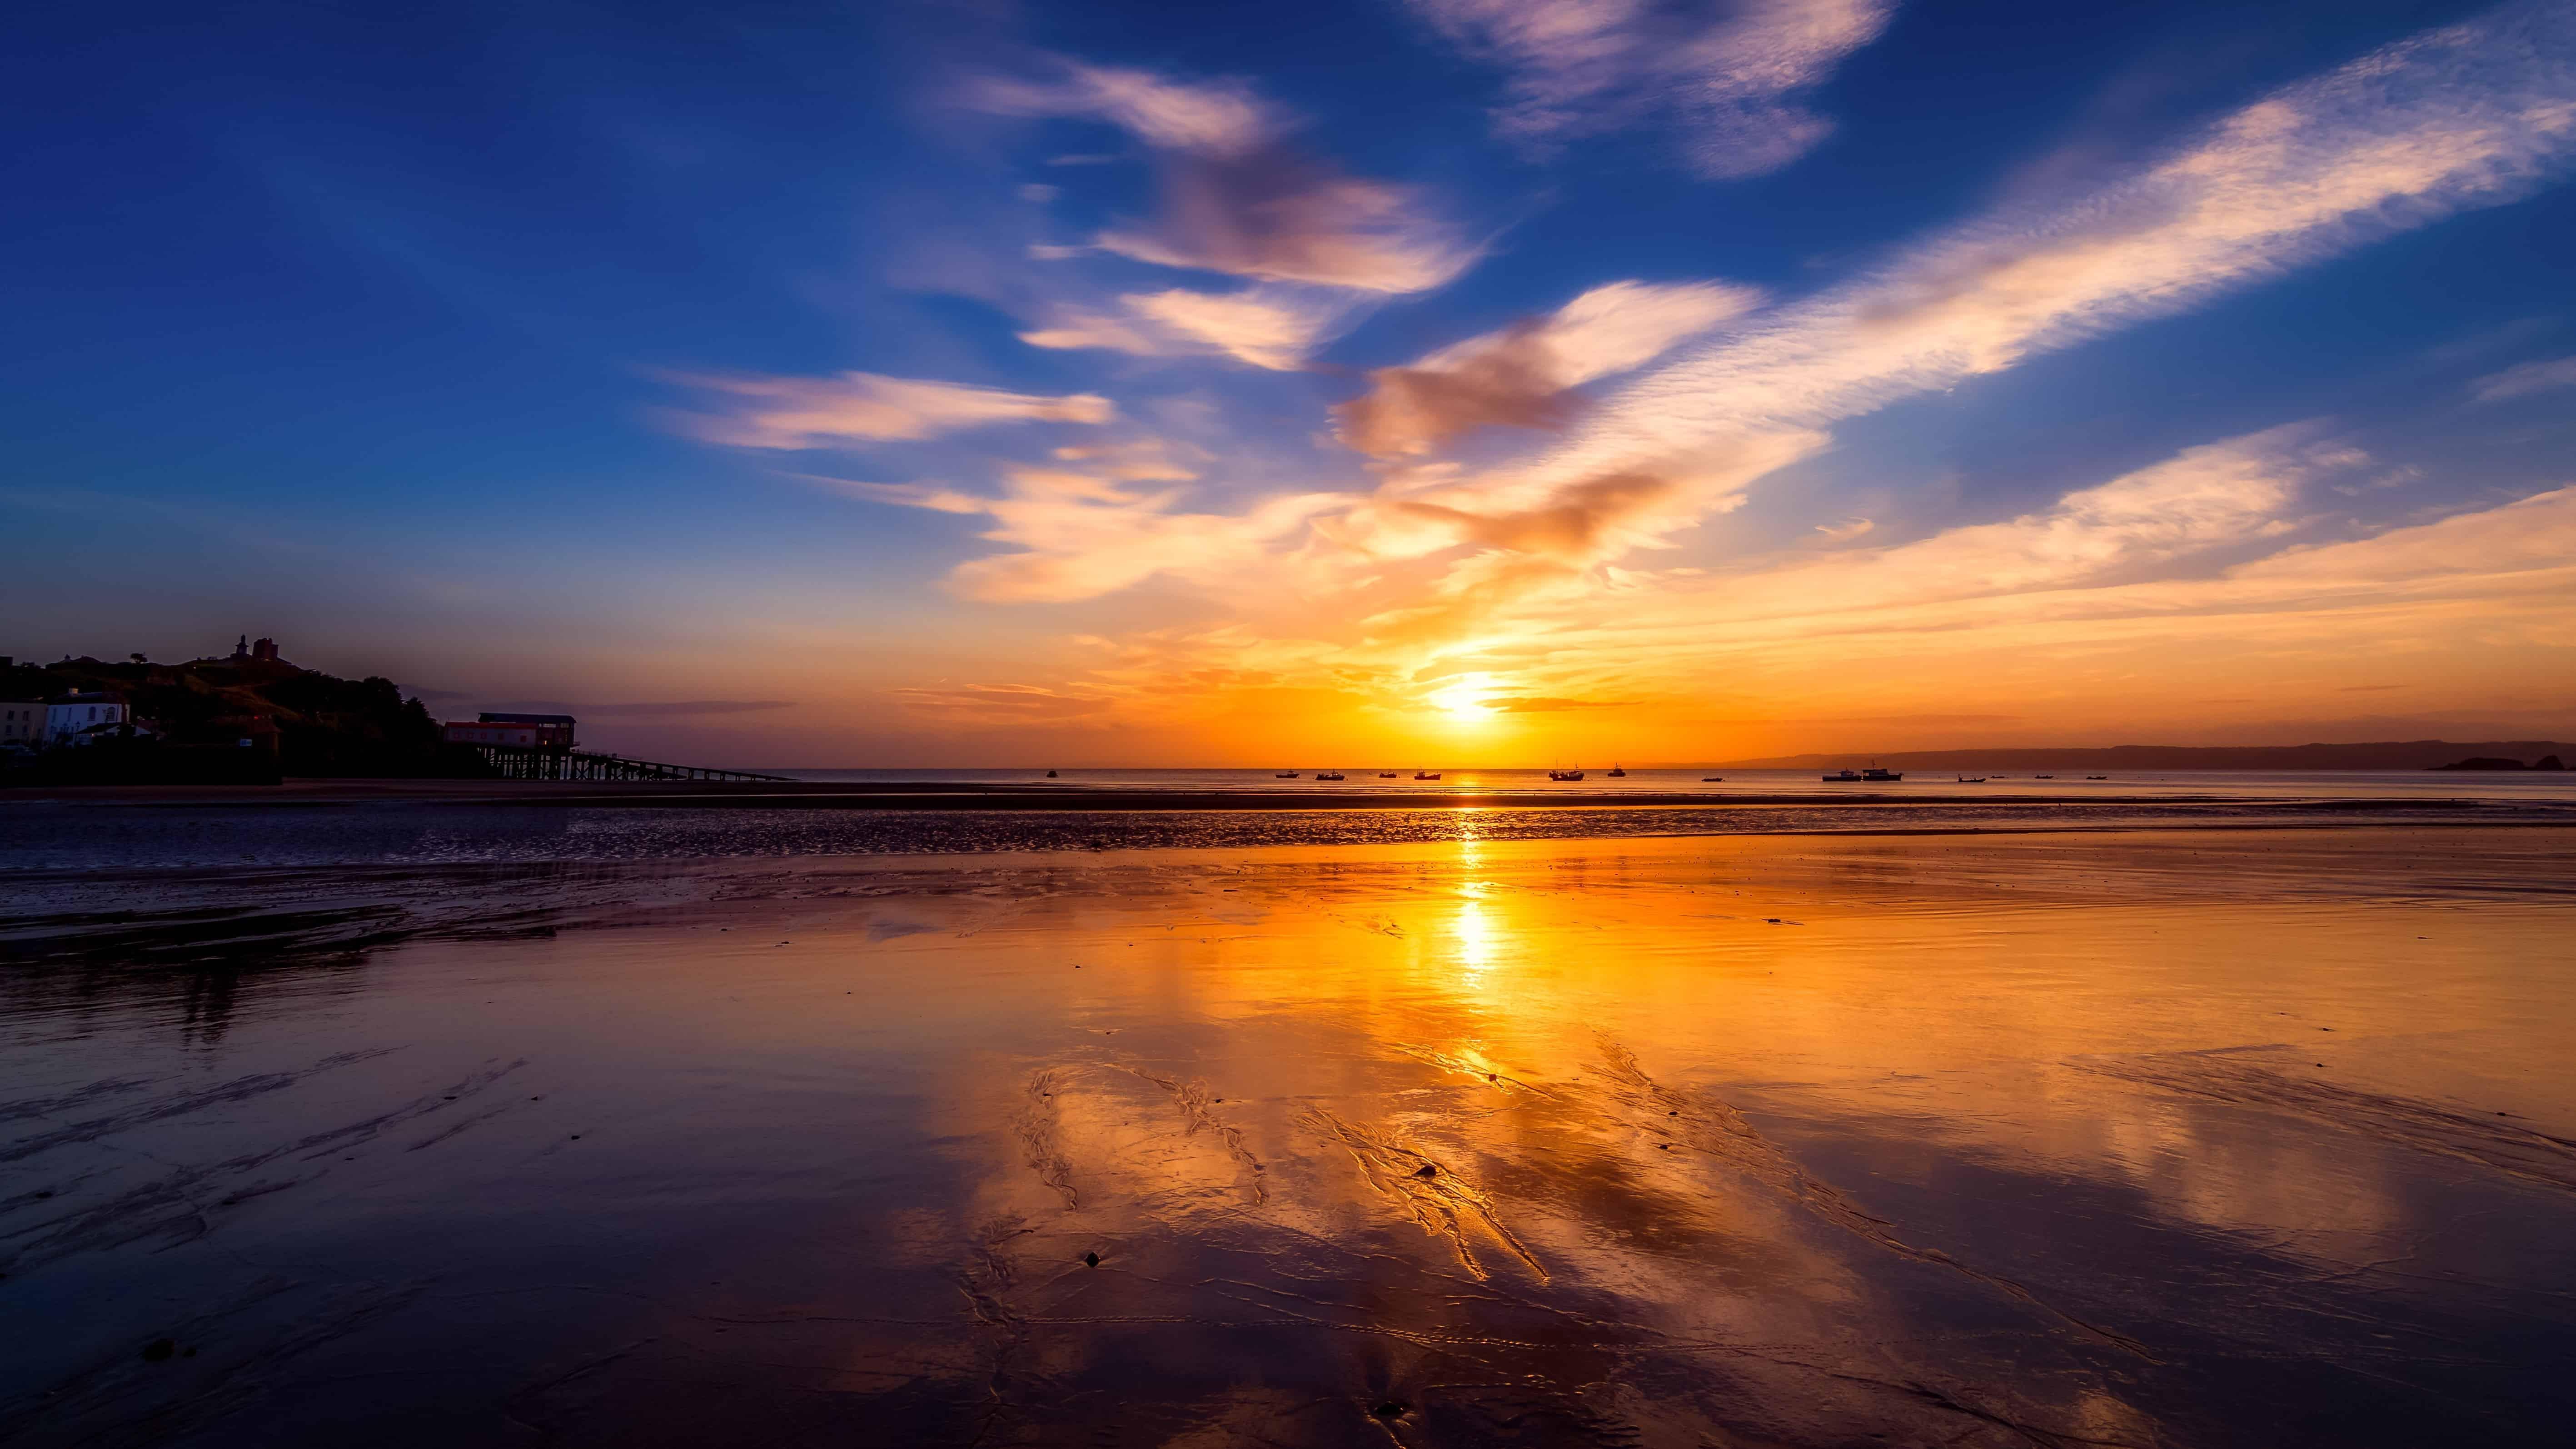 Free picture: water, sea, sunrise, beach, dusk, dawn, sand, sky